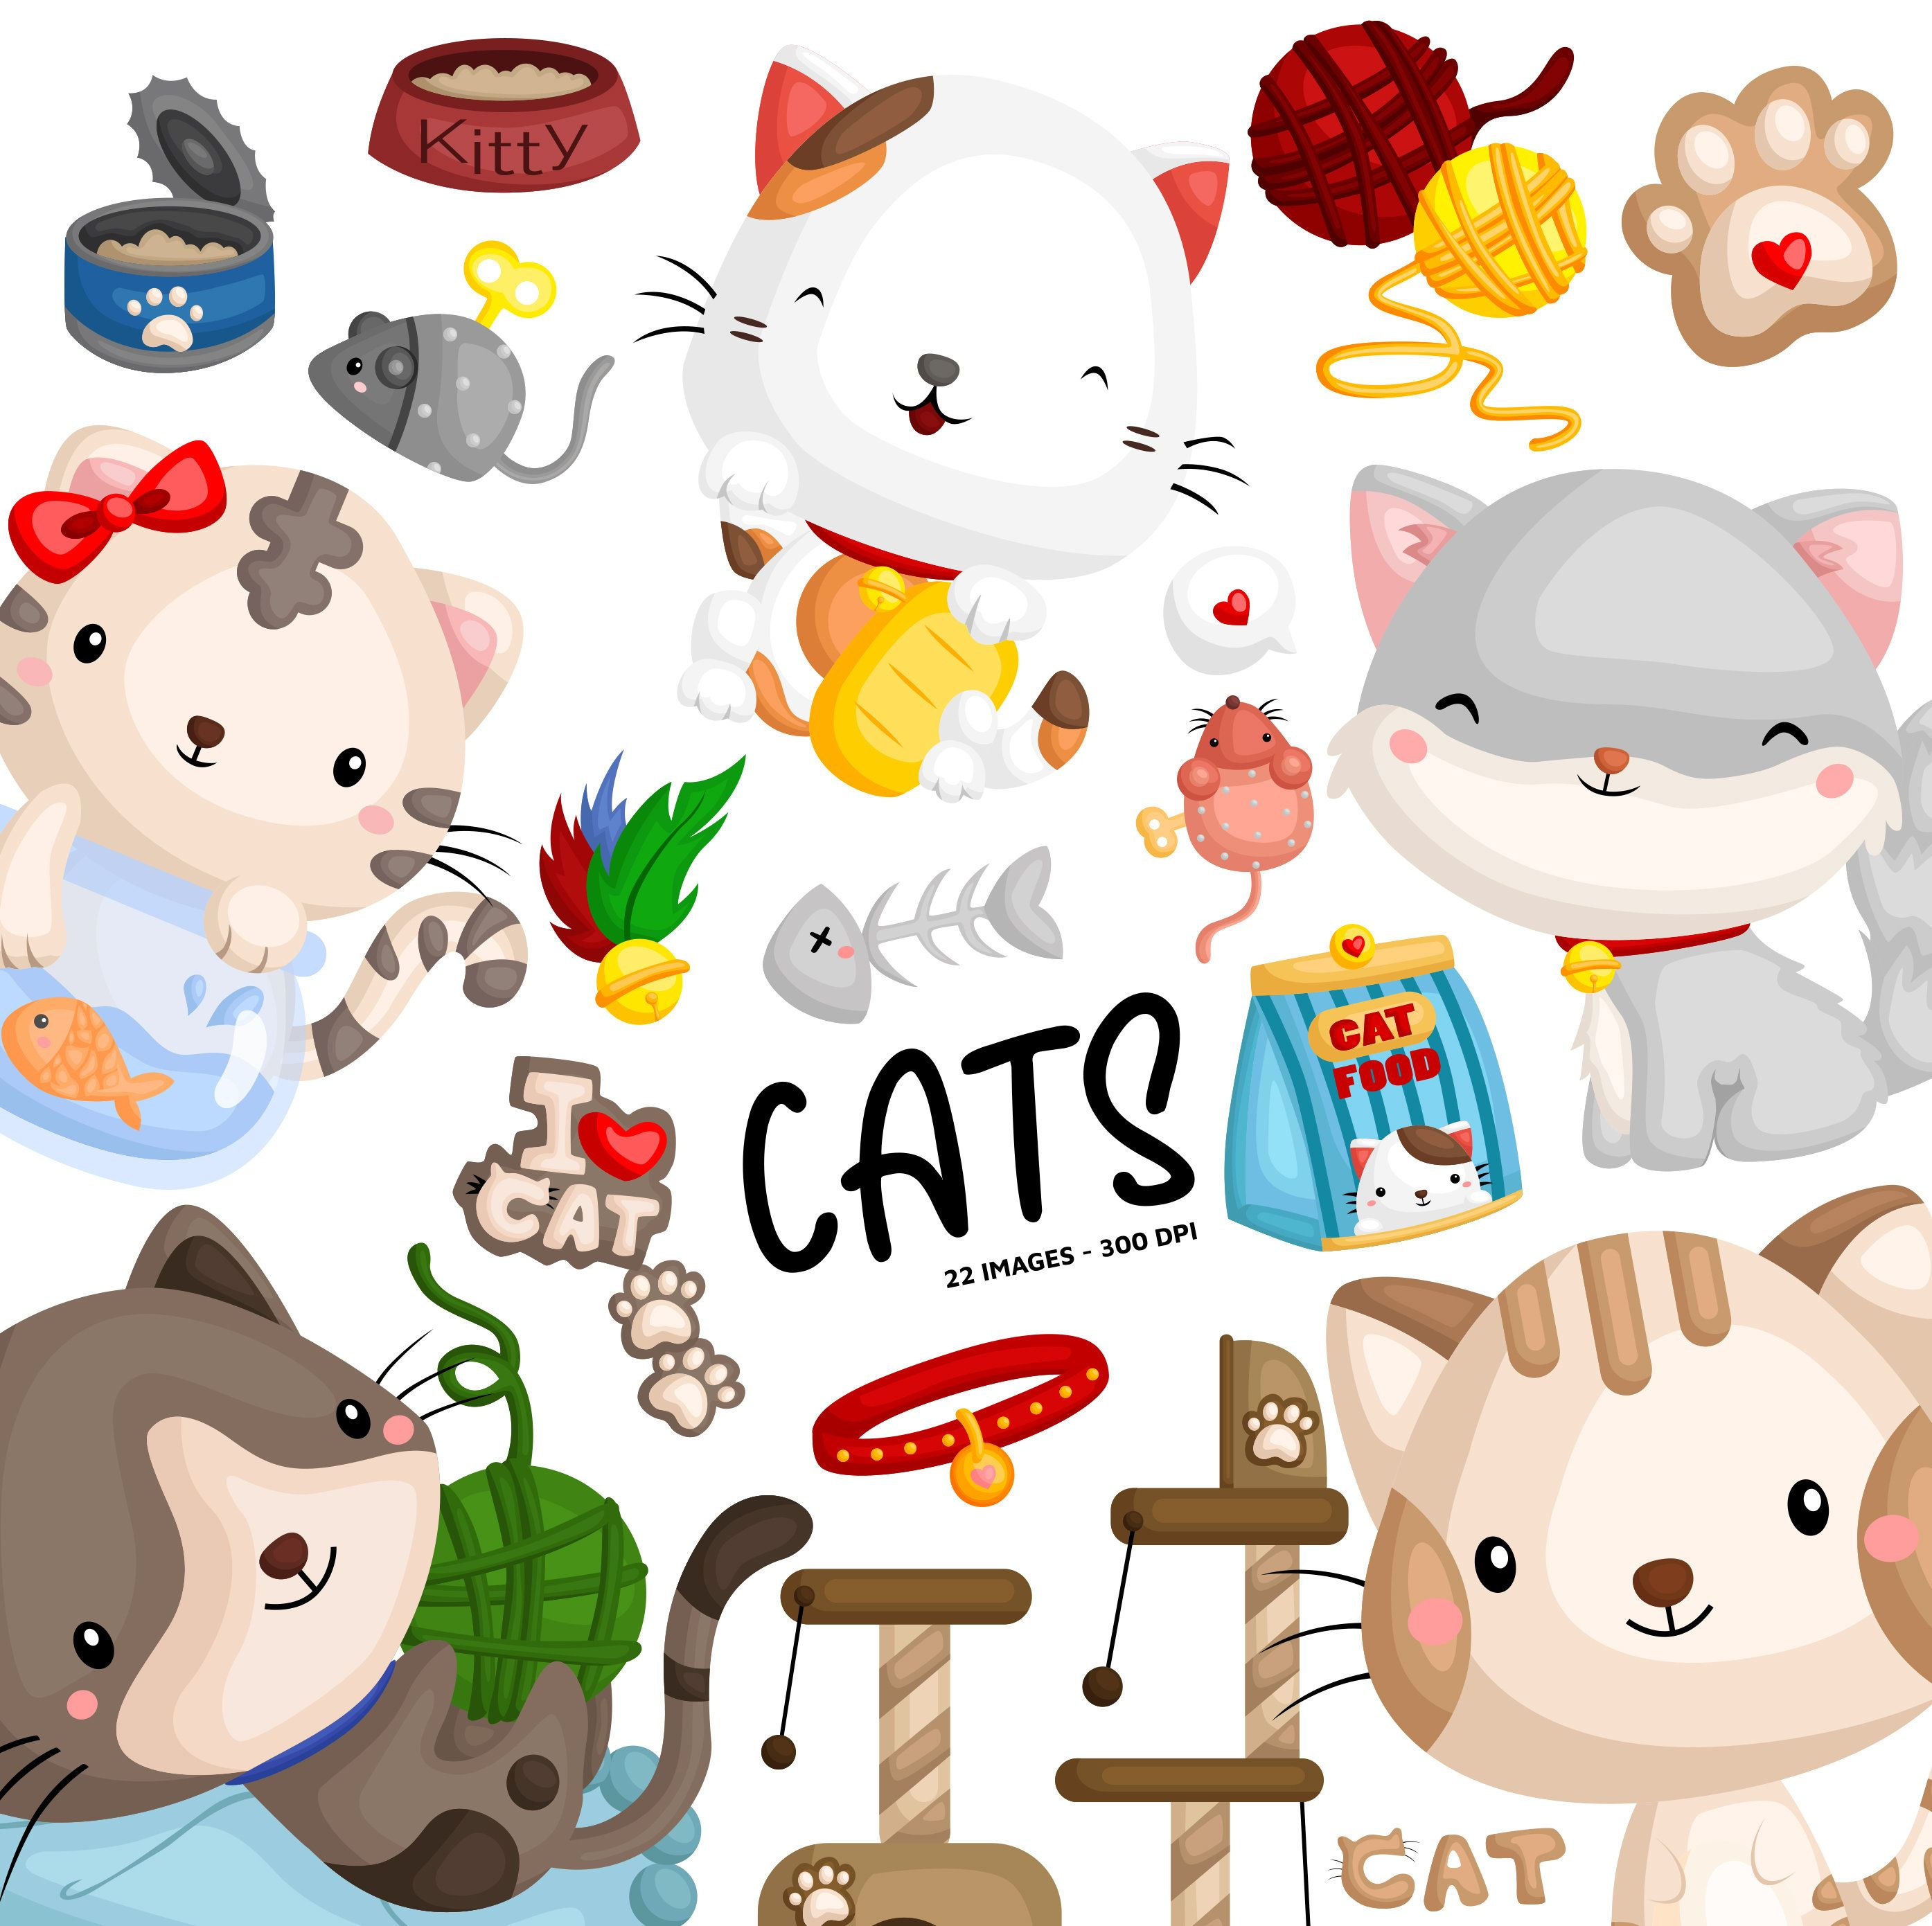 Cute Cats Clipart Feline Animal Clip Art Home Pet Free Etsy In 2021 Animal Clipart Cat Clipart Cute Animal Clipart